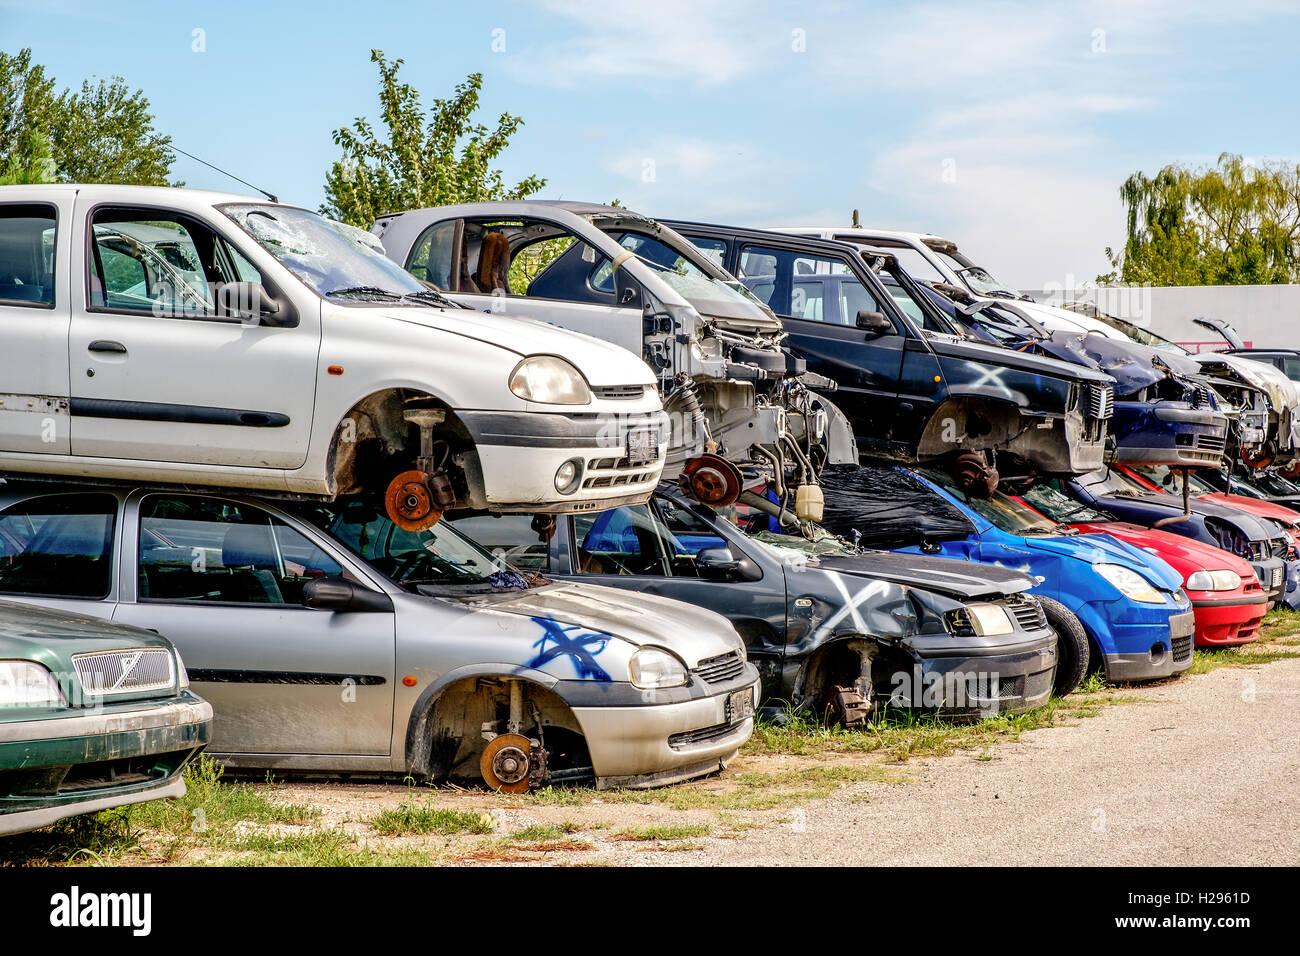 crashed cars junkyard Stock Photo: 121904201 - Alamy